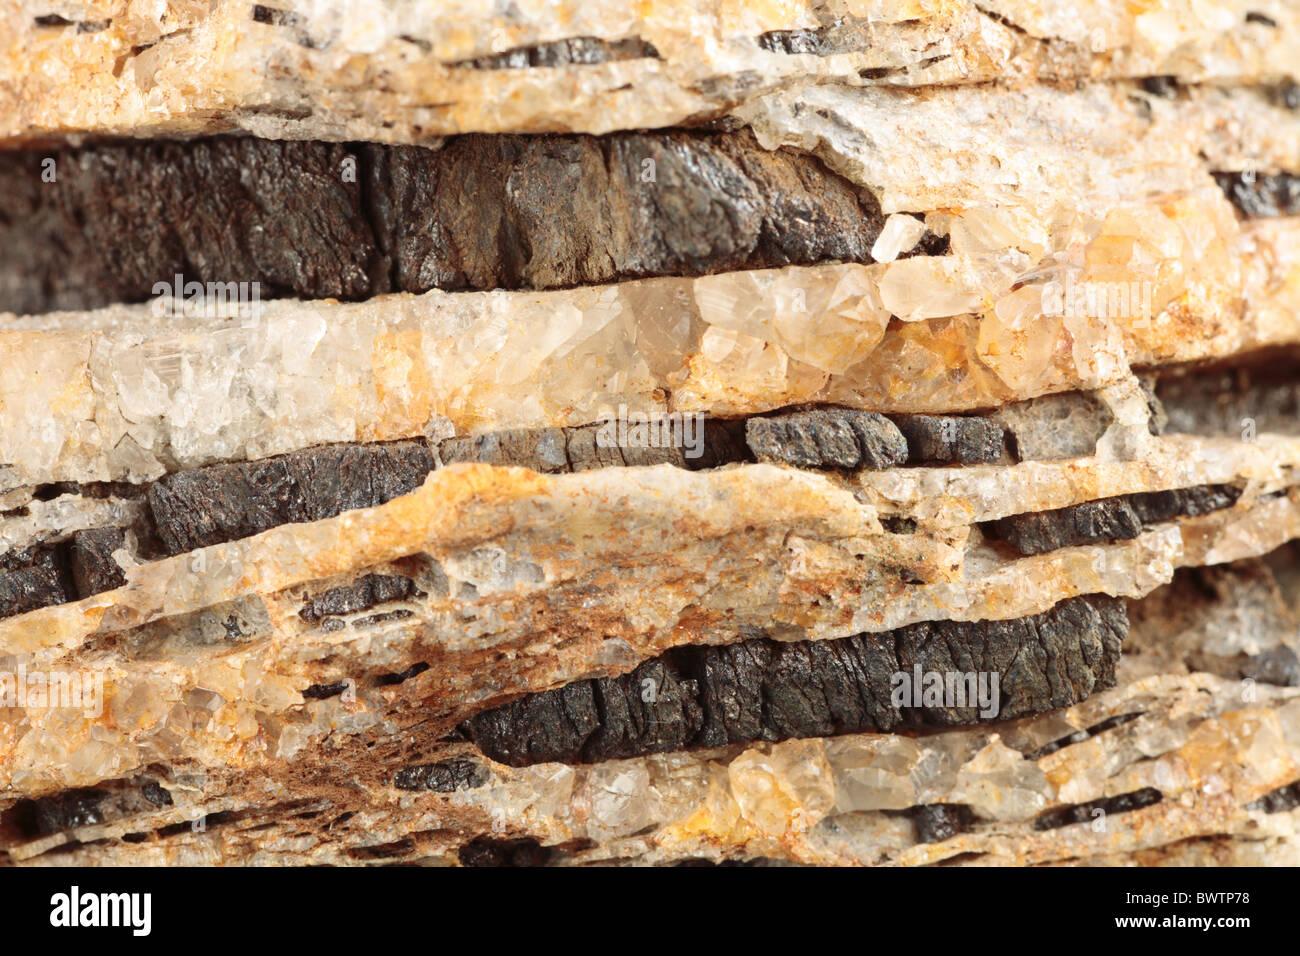 mineral vein veining geology geological rock mineralisation ore wales welsh britain british sulphide zinc sphalerite - Stock Image